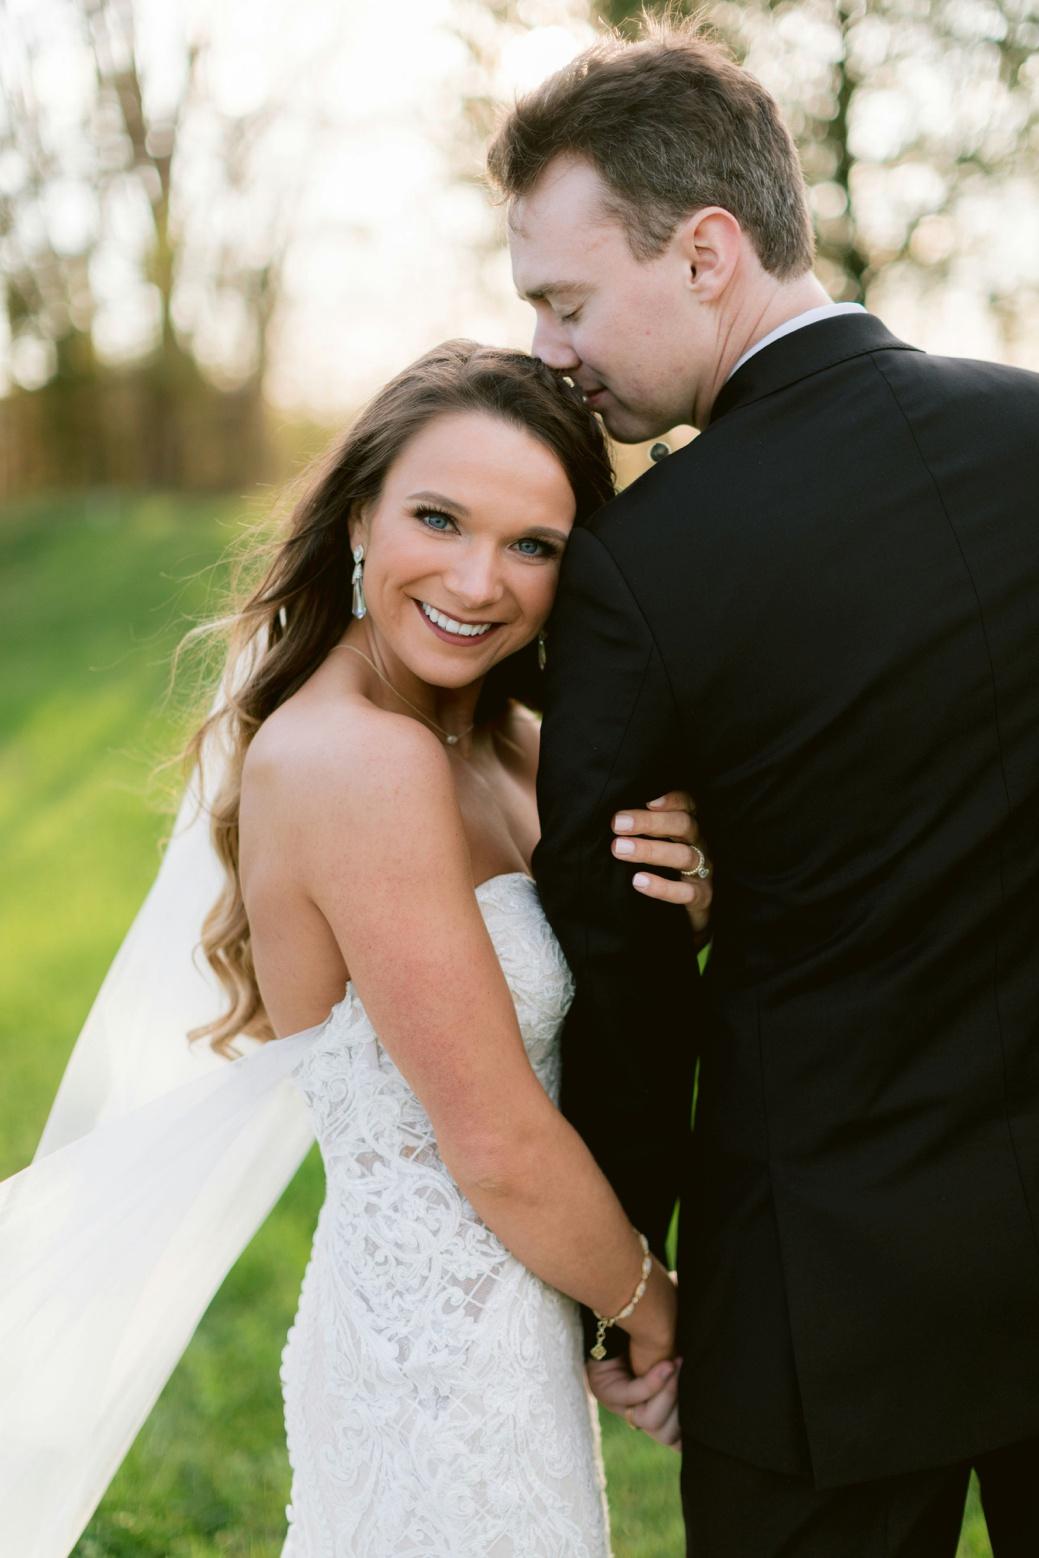 Olde-Dobbin-Station-Wedding-Photographer-Kelly-35